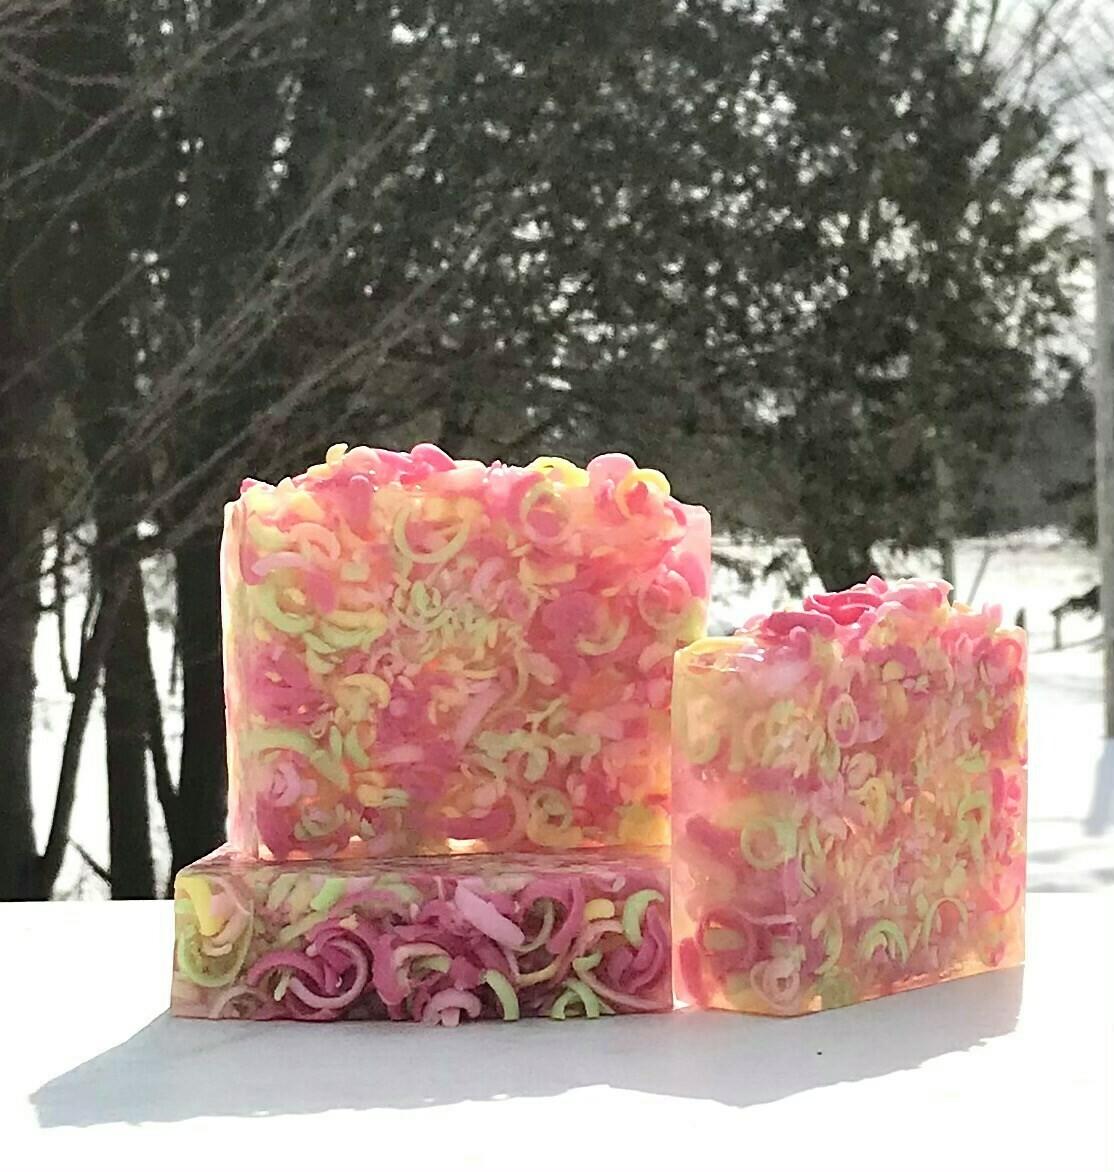 Honeysuckle Blossoms - Glycerin Soap